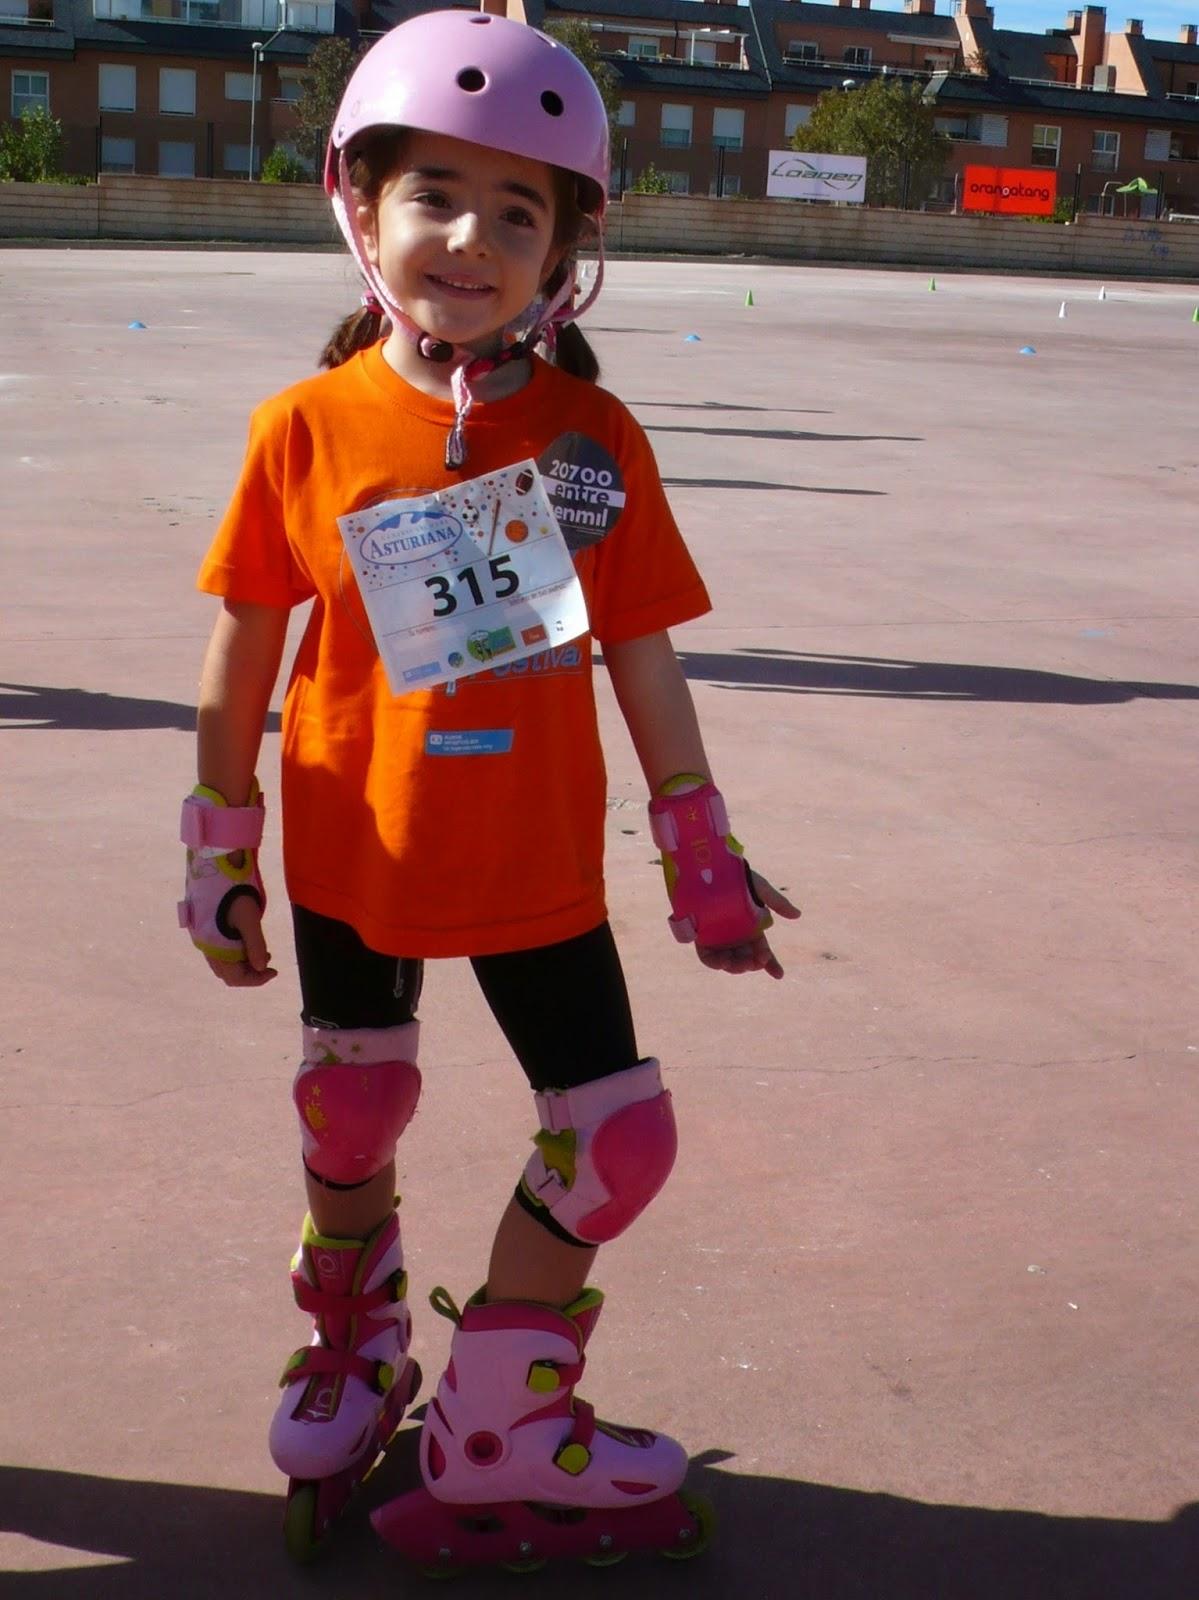 Sports Kids Festival Pequeña Fashionista Uno entre cien mil